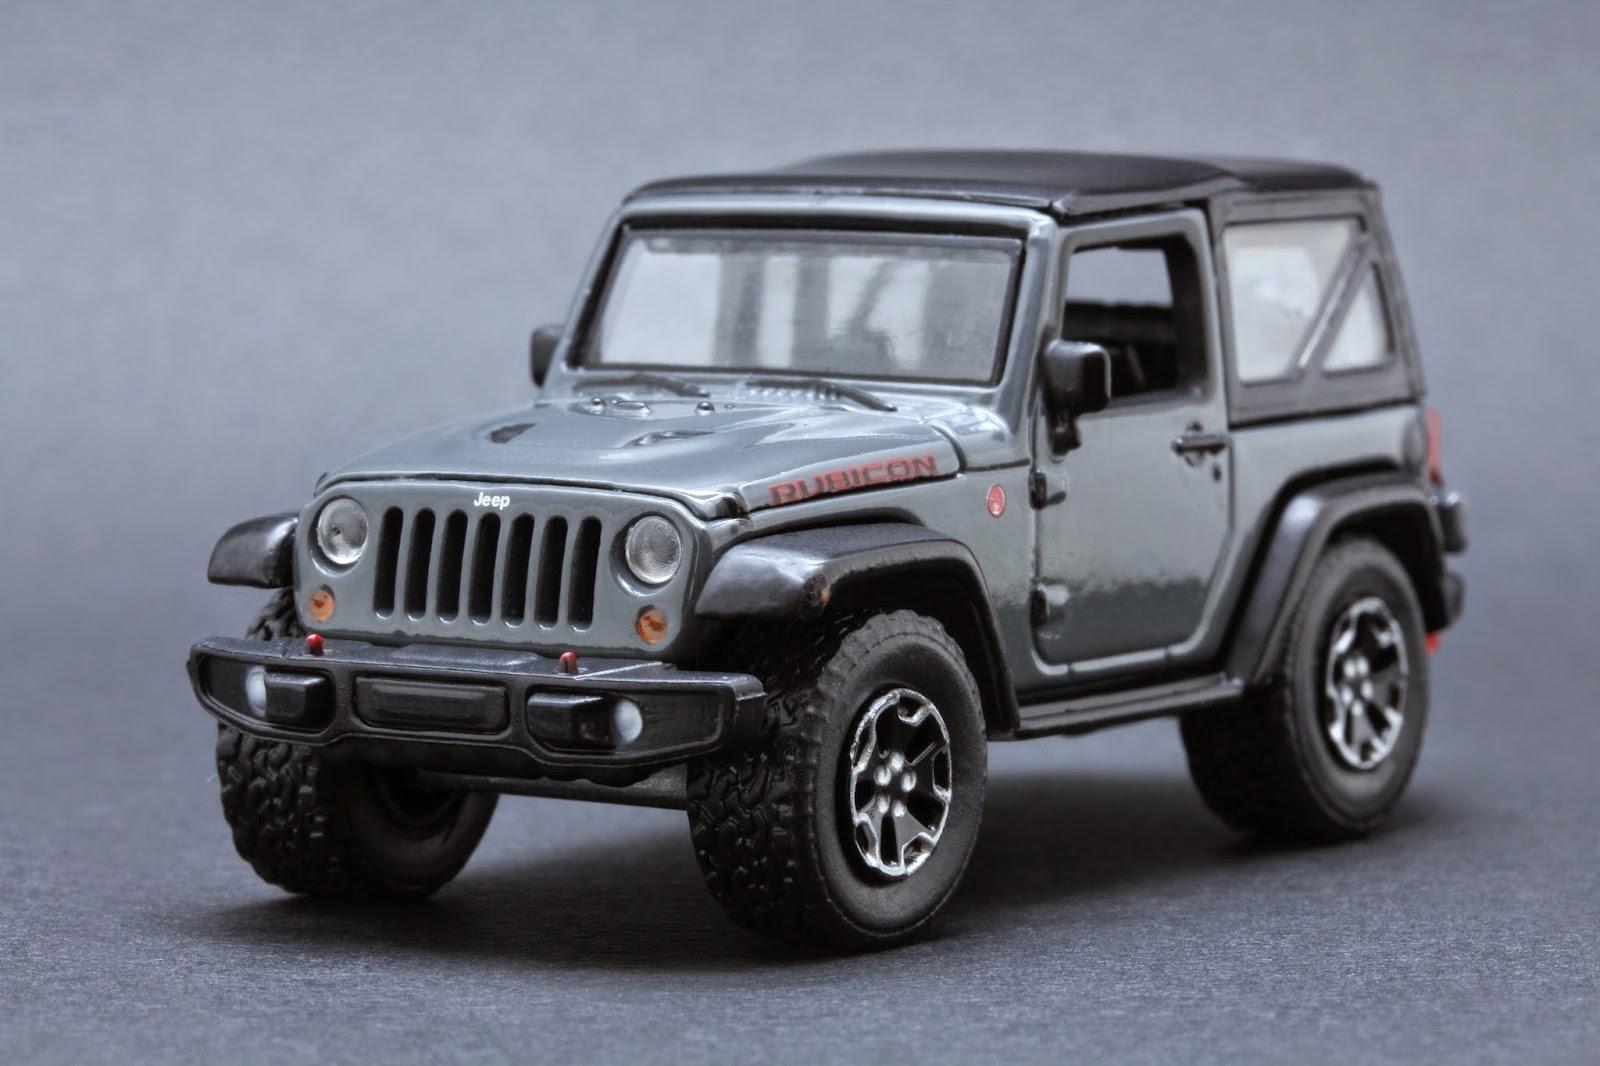 diecast hobbist 2014 jeep wrangler rubicon x. Black Bedroom Furniture Sets. Home Design Ideas